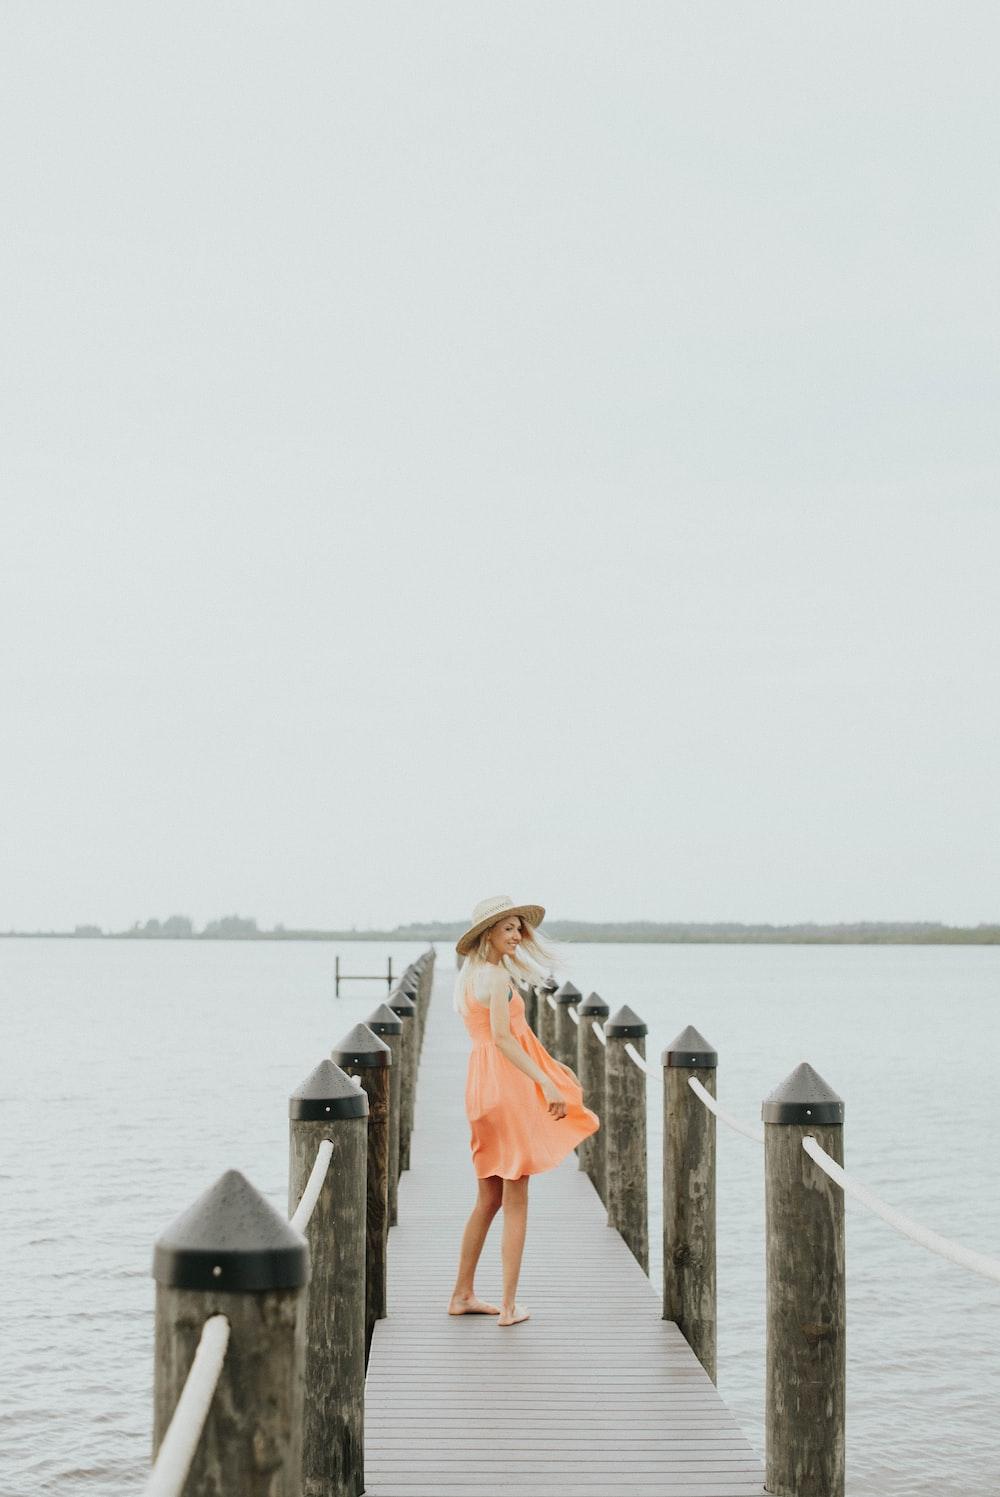 woman in orange spaghetti strap mini dress standing on brown wooden dock during daytime